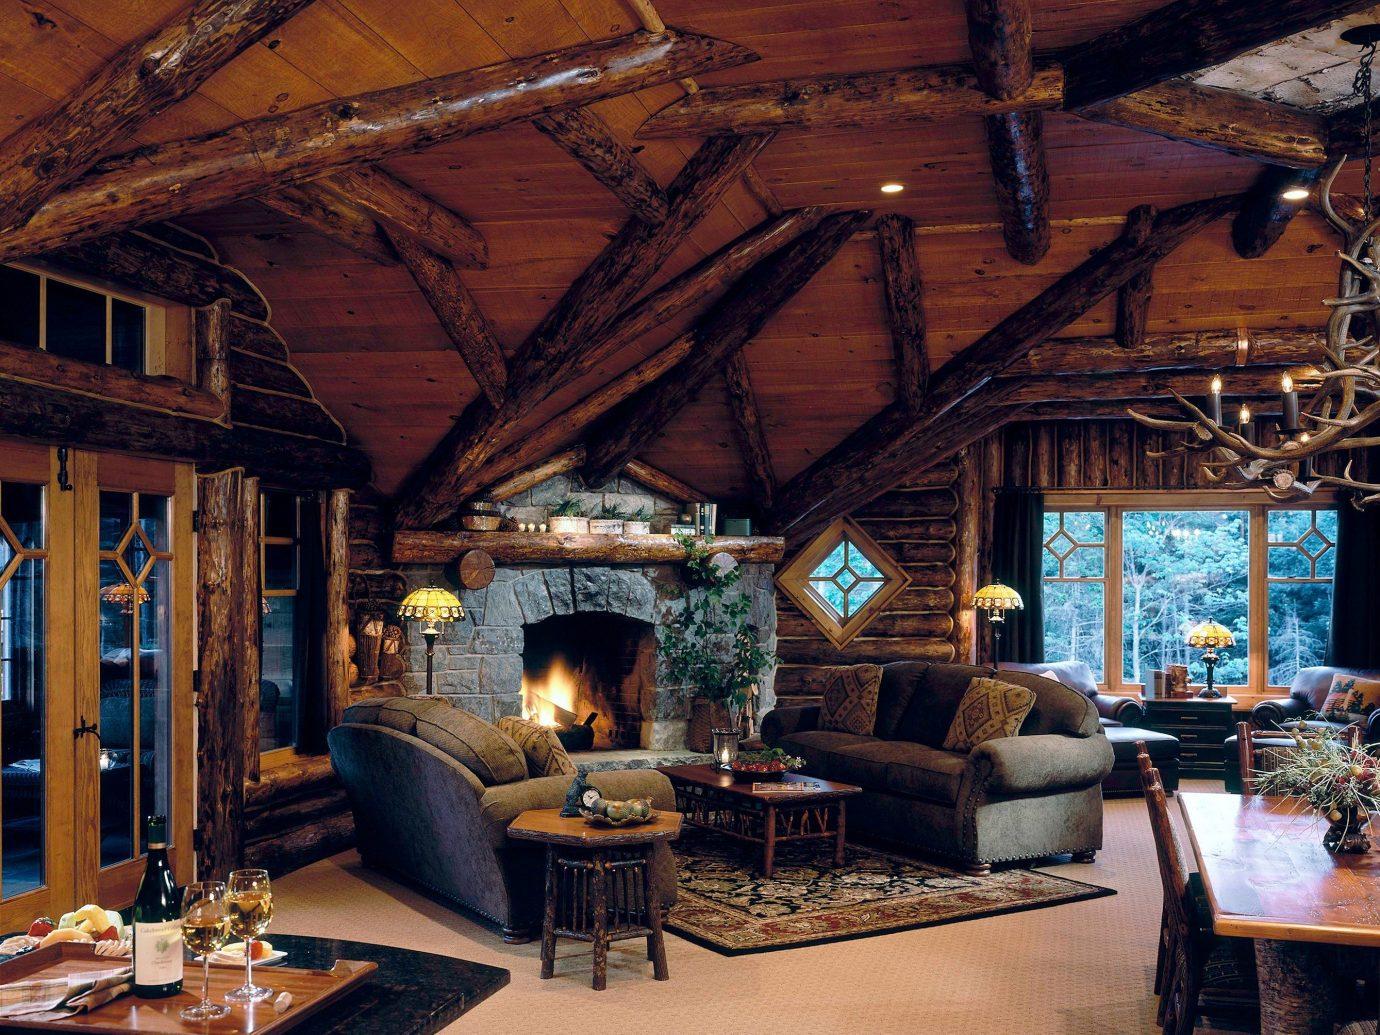 Hotels indoor ceiling room Living property building estate house living room log cabin home interior design cottage wood outdoor structure farmhouse furniture area